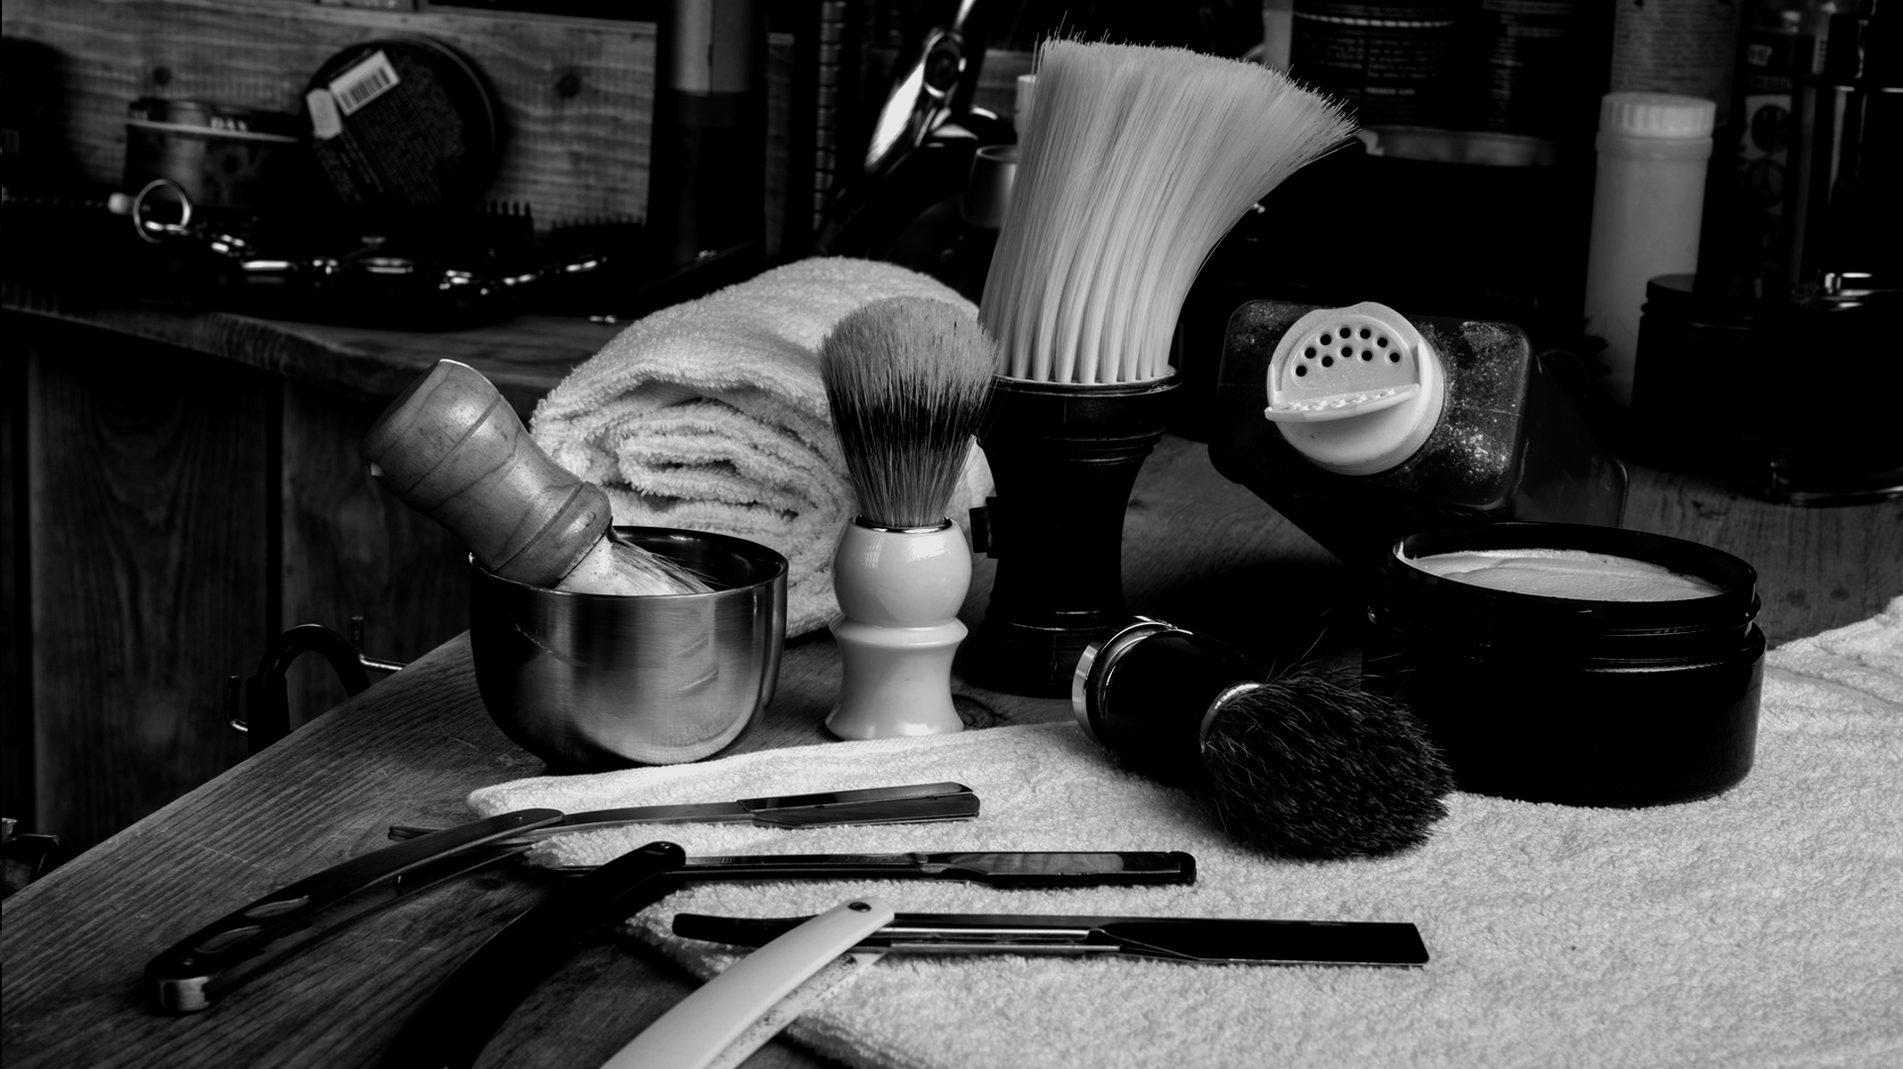 hairworkshop ihr friseur in berlin prenzlauer berg. Black Bedroom Furniture Sets. Home Design Ideas